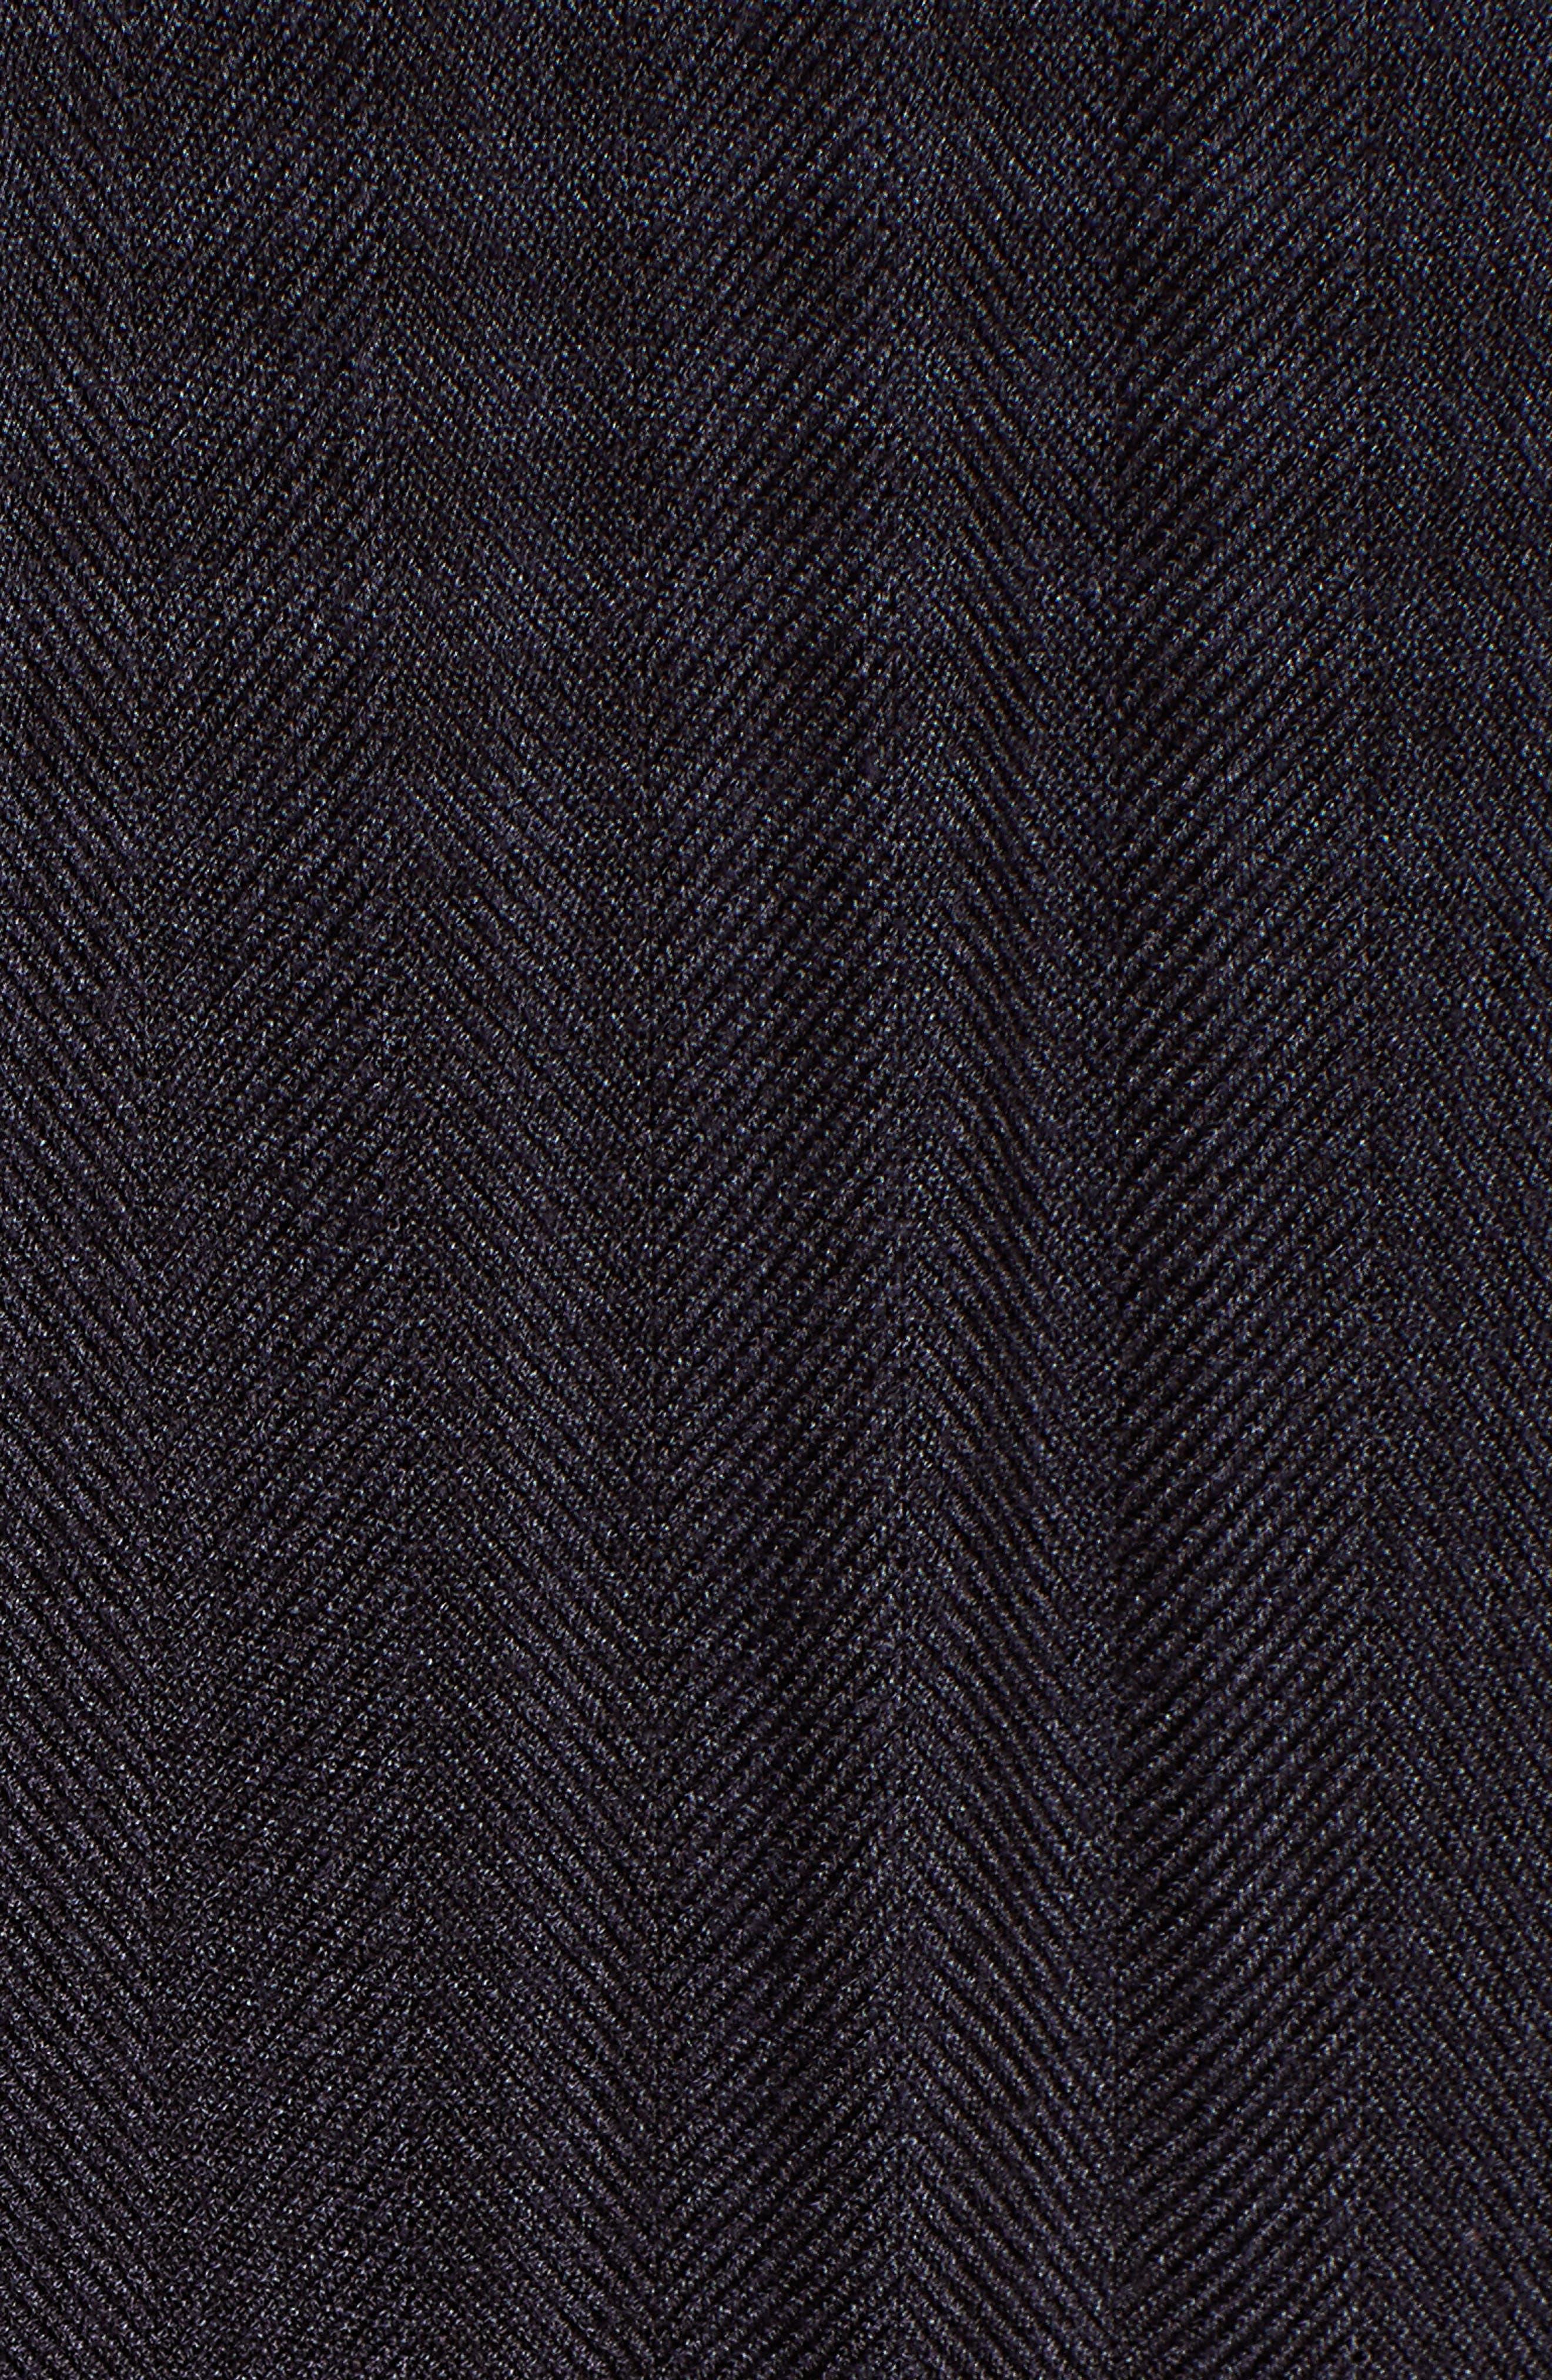 Hunter Plaid Shirt,                             Alternate thumbnail 6, color,                             CHARCOAL SHADOW